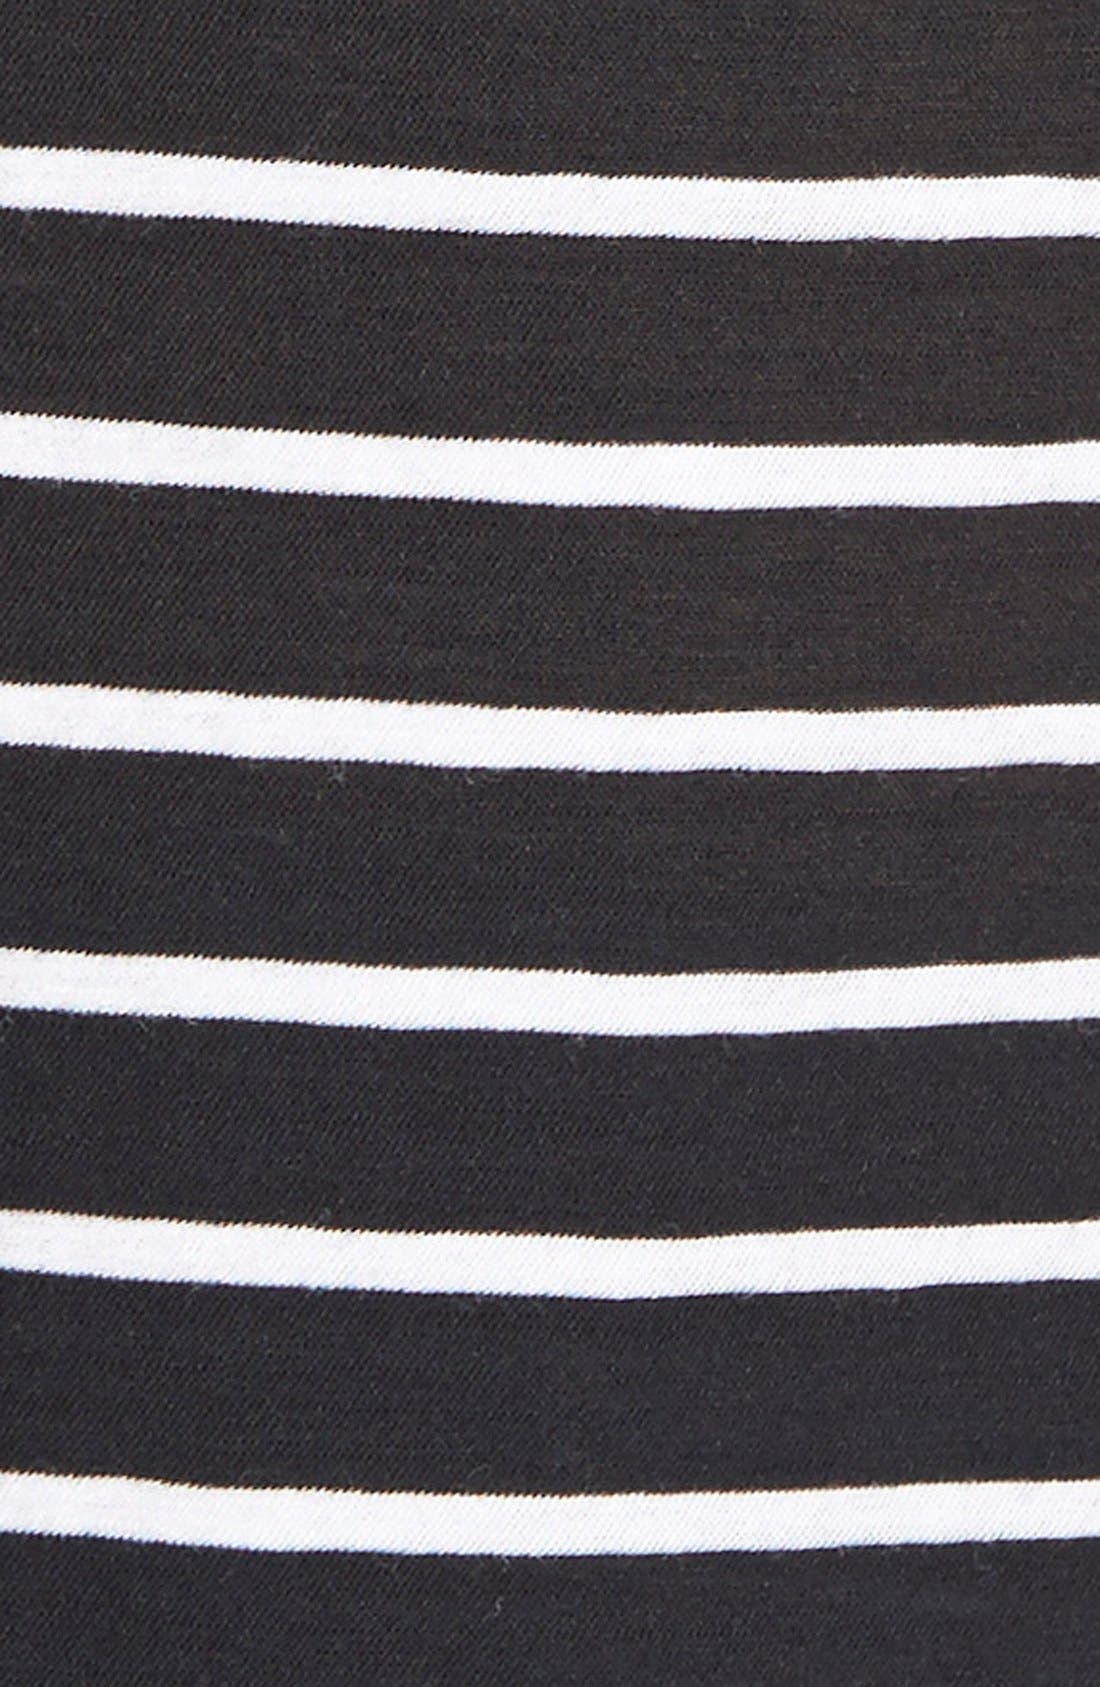 Alternate Image 3  - James Perse Classic Stripe Tee